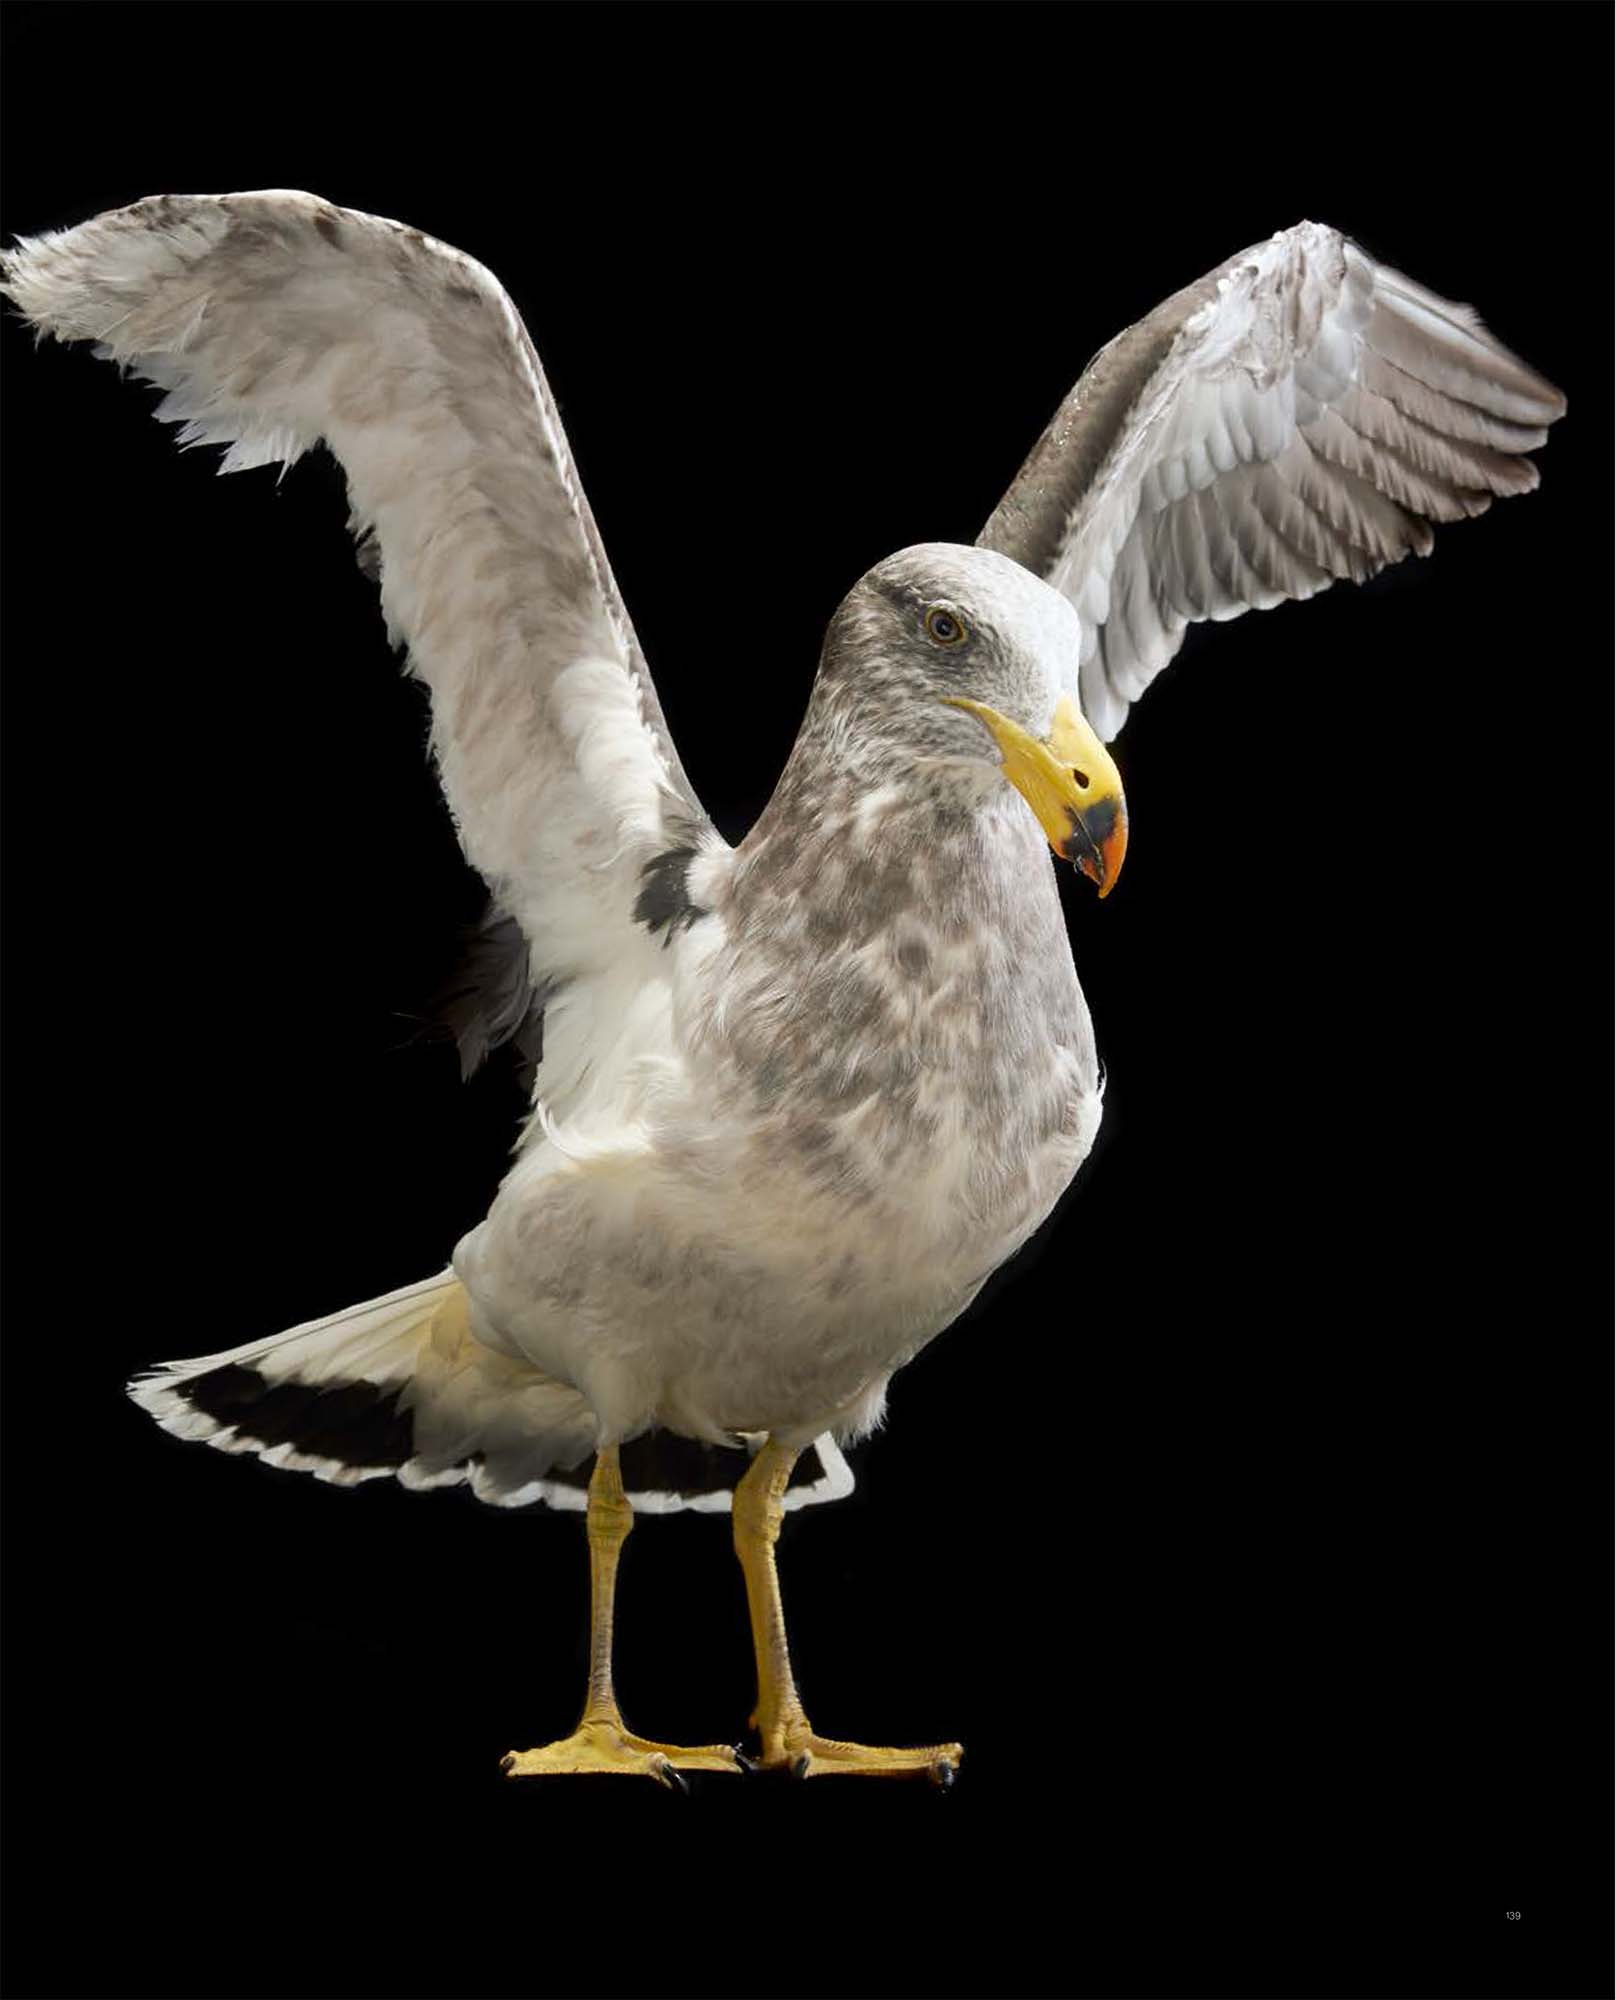 BIRD Gary Heery Book-completemmockup-141.jpg